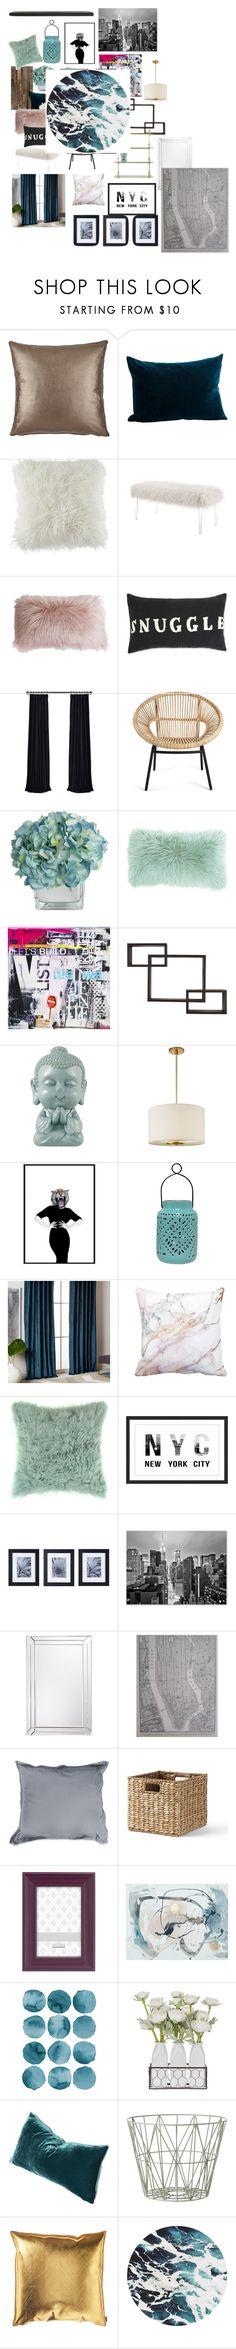 """Untitled #2105"" by bucketlistdiary on Polyvore featuring interior, interiors, interior design, home, home decor, interior decorating, Barneys New York, BCBGeneration, Linon and Danya B"